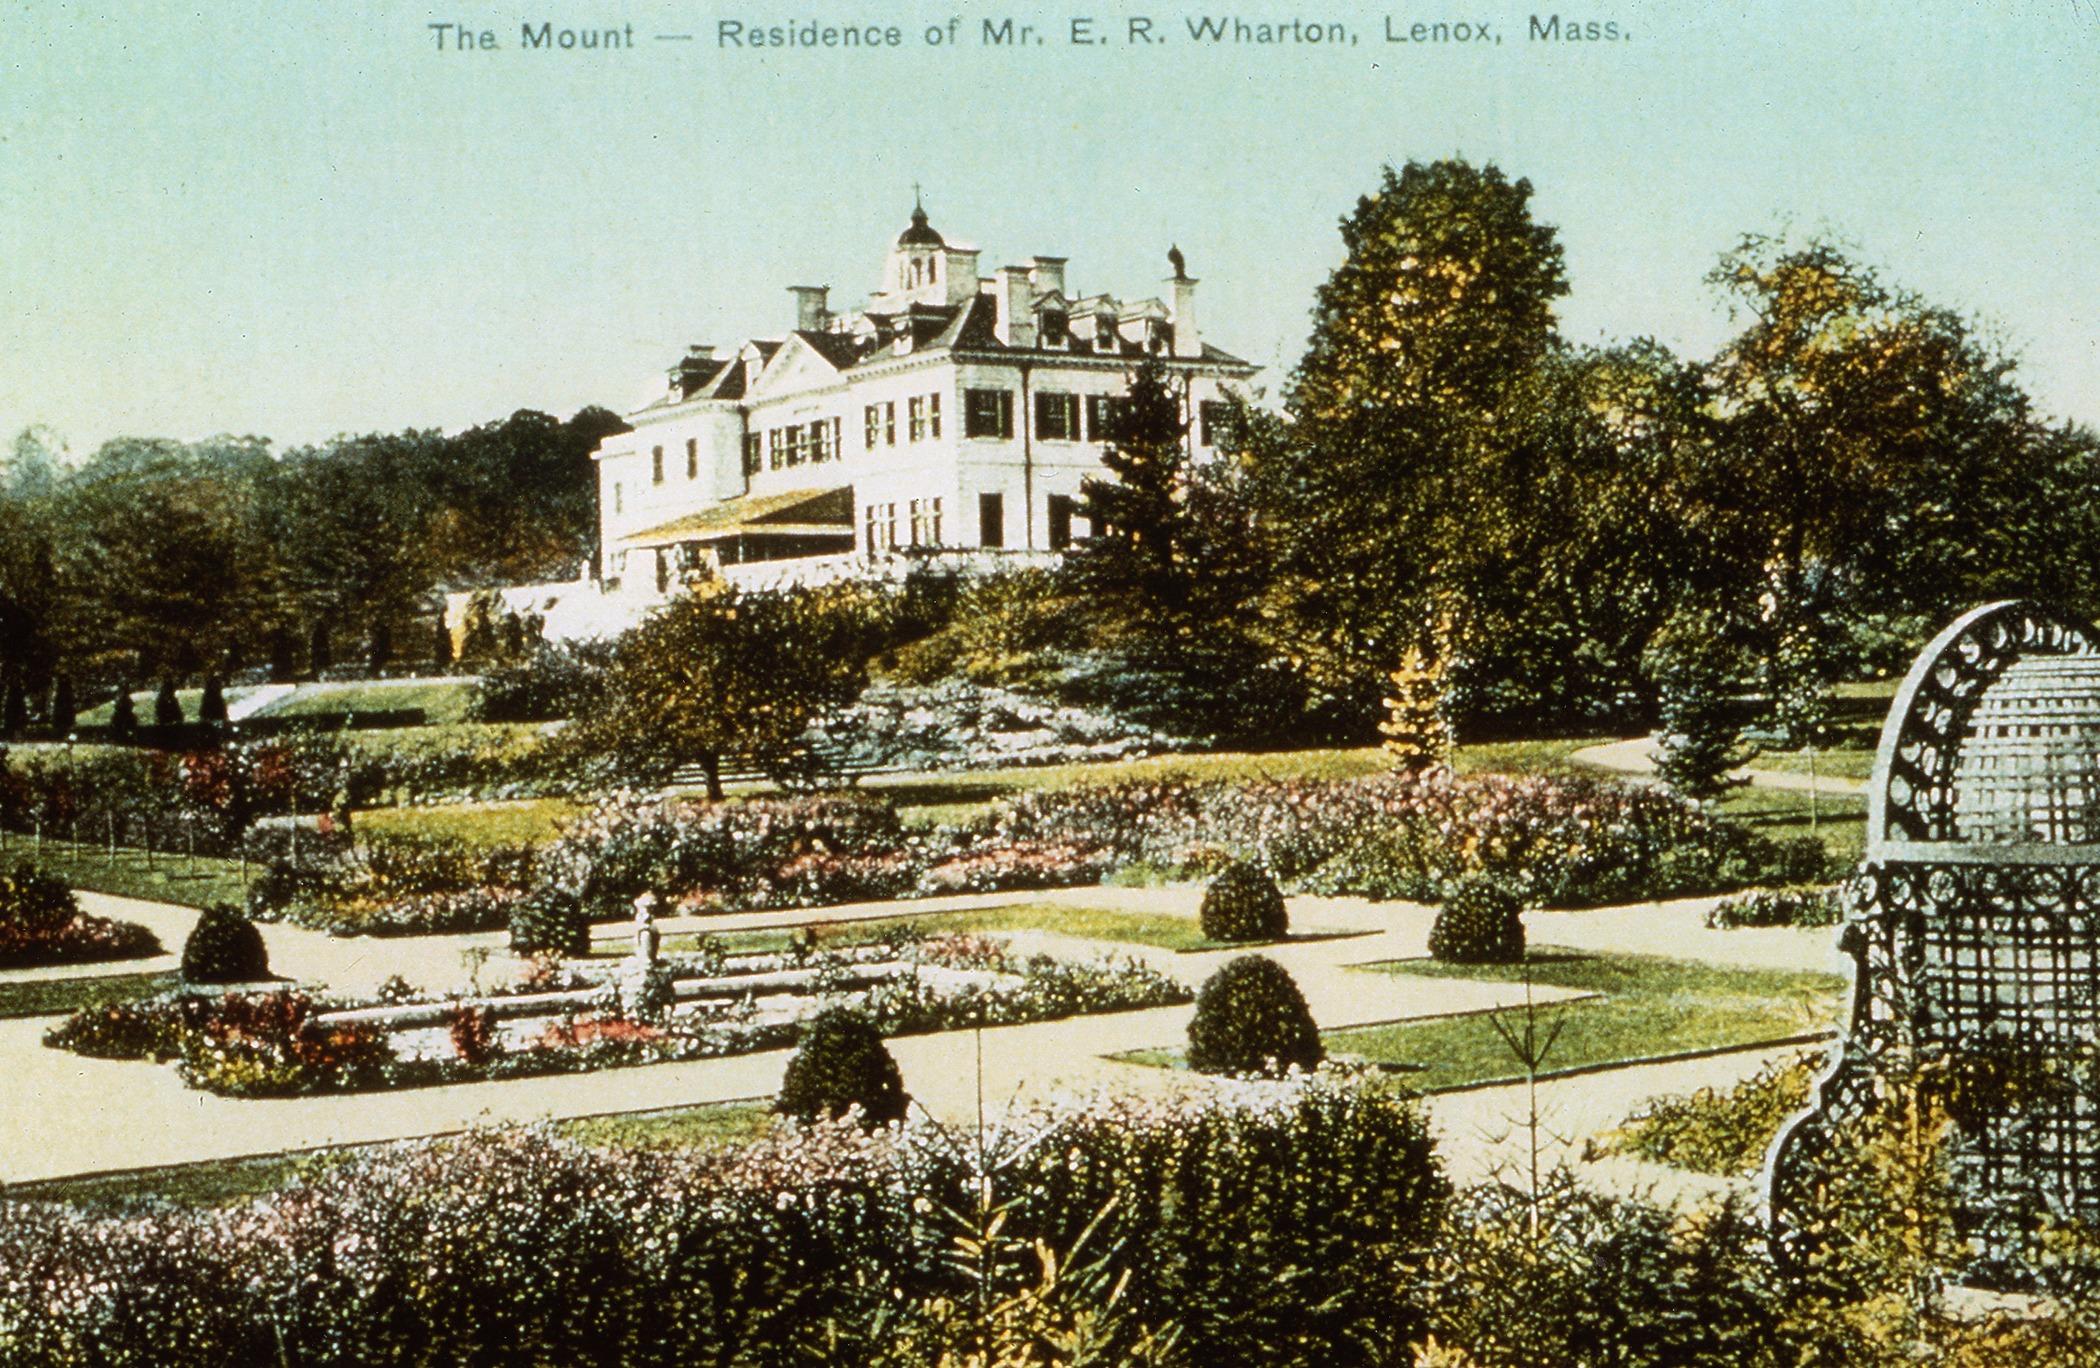 The Mount tinted postcard circa 1910 courtesy Lenox Library Association